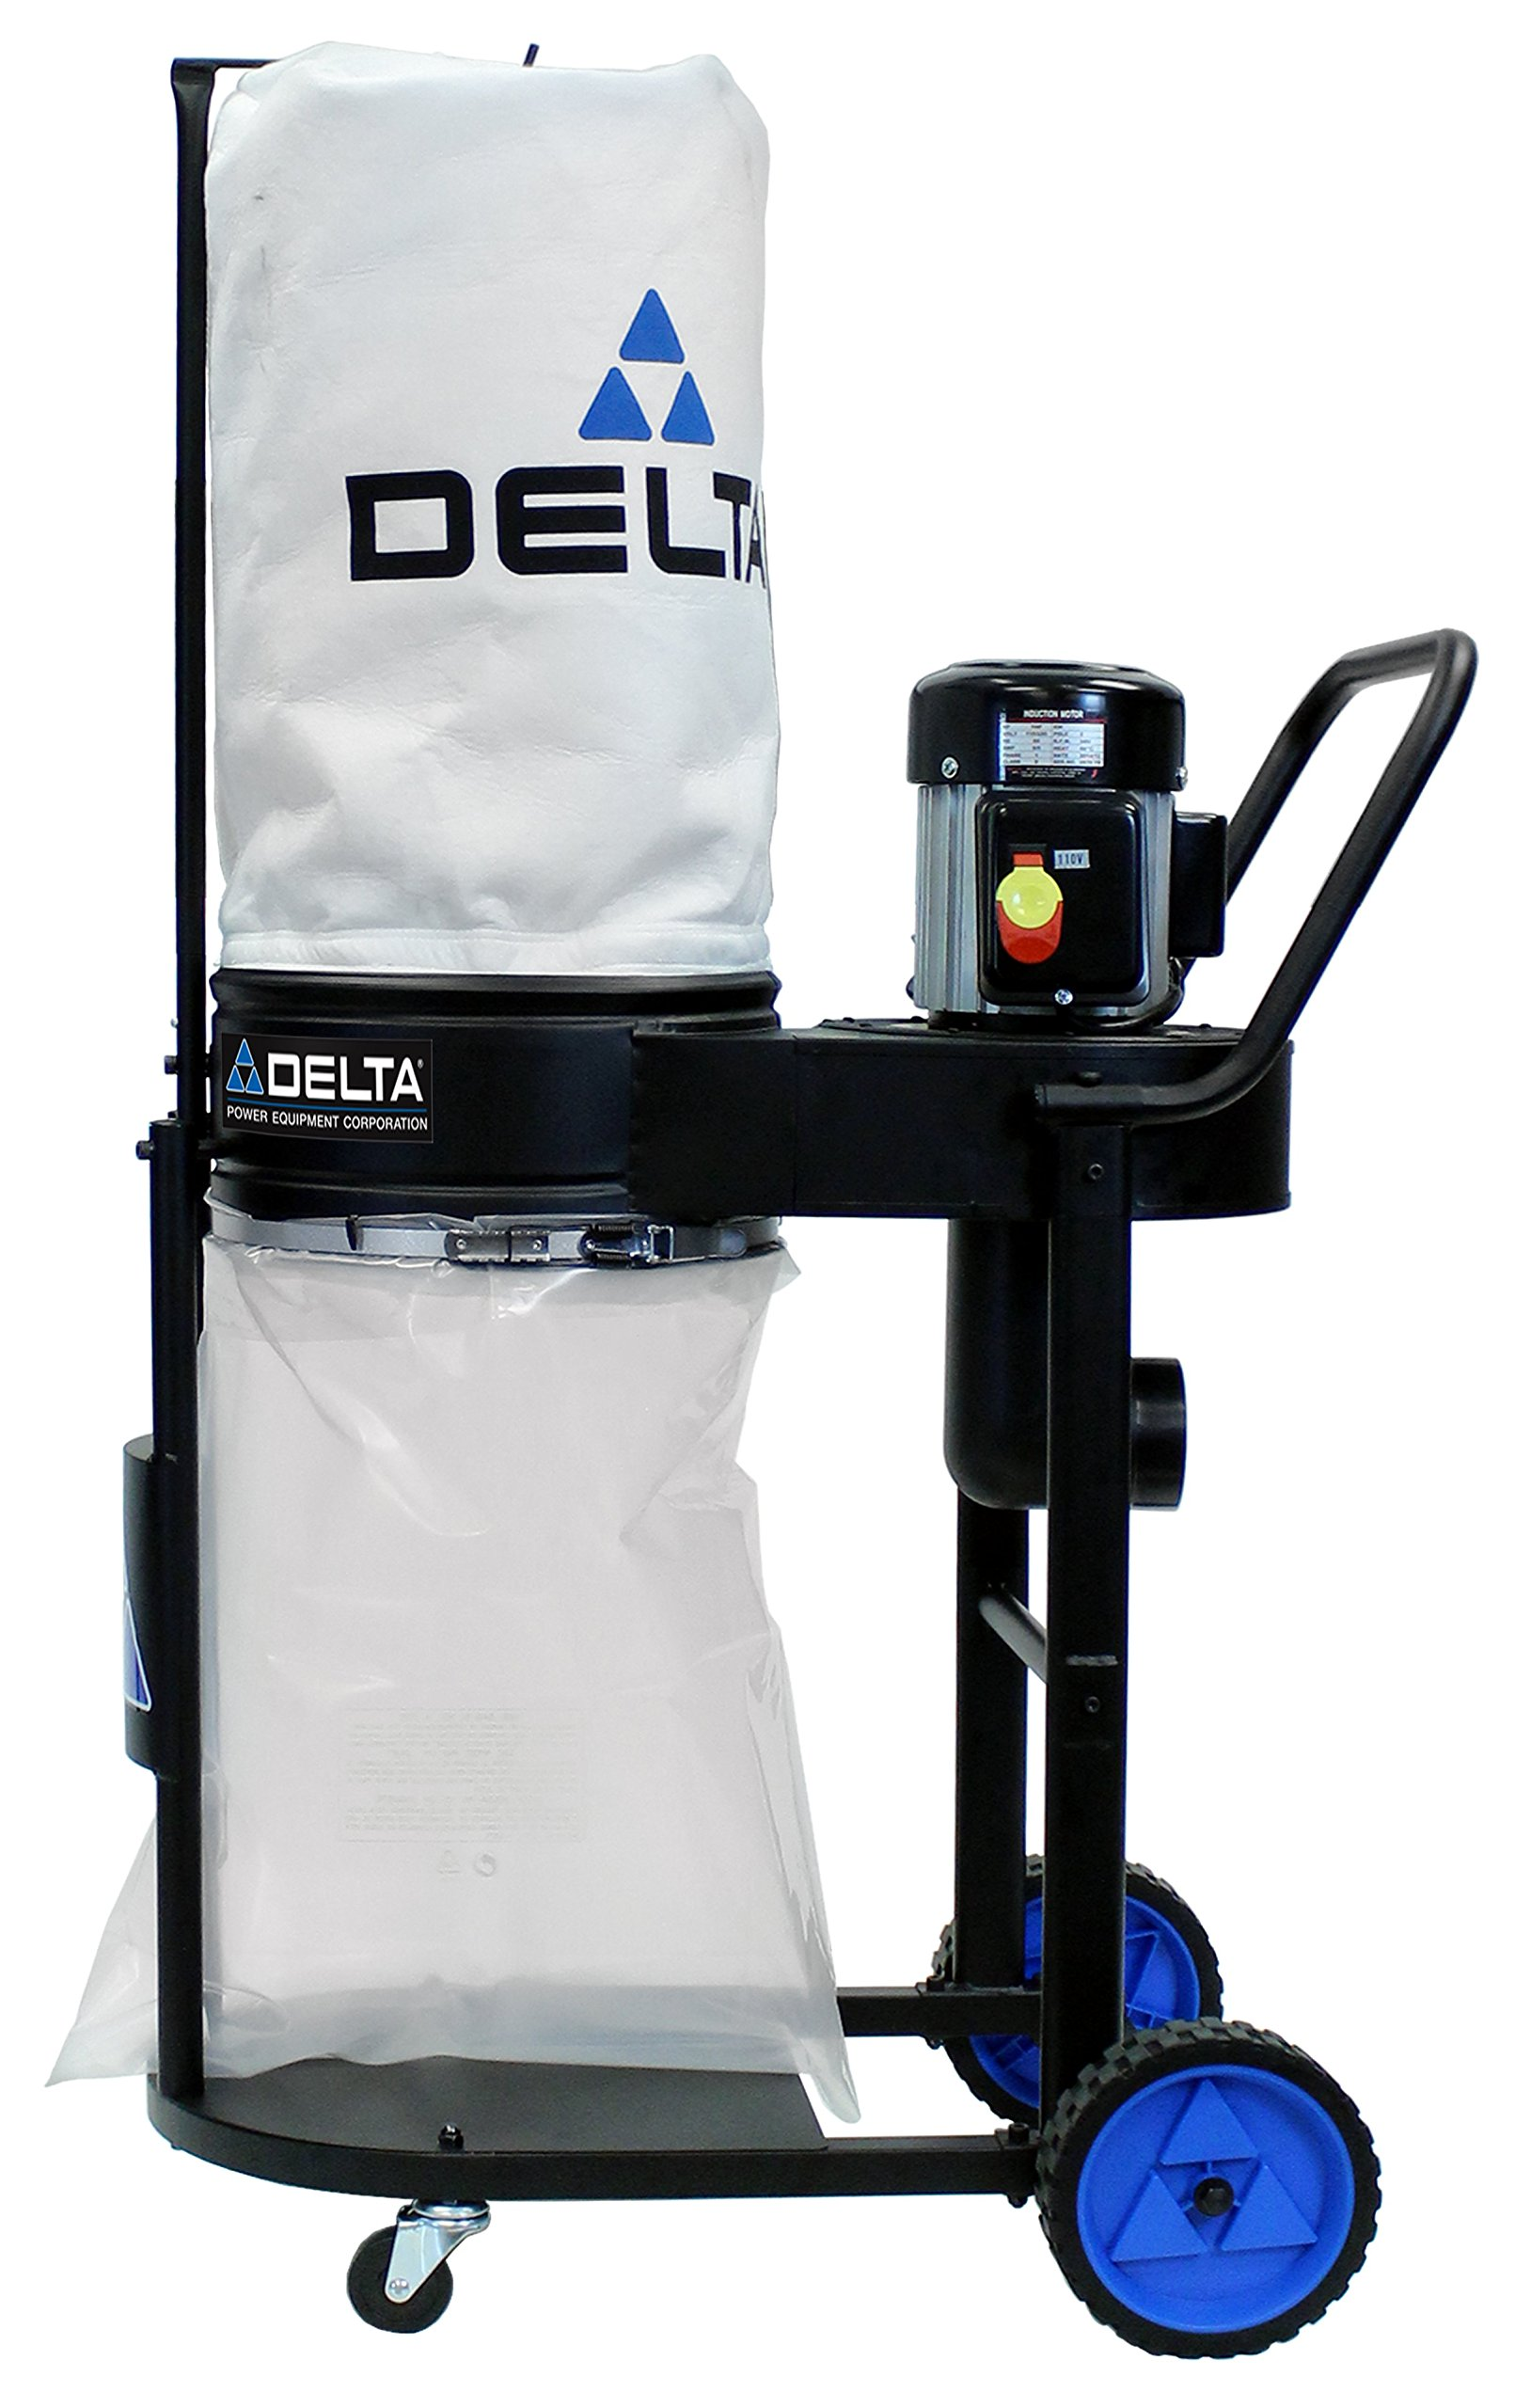 Delta Power Equipment 50 723T2 Collector